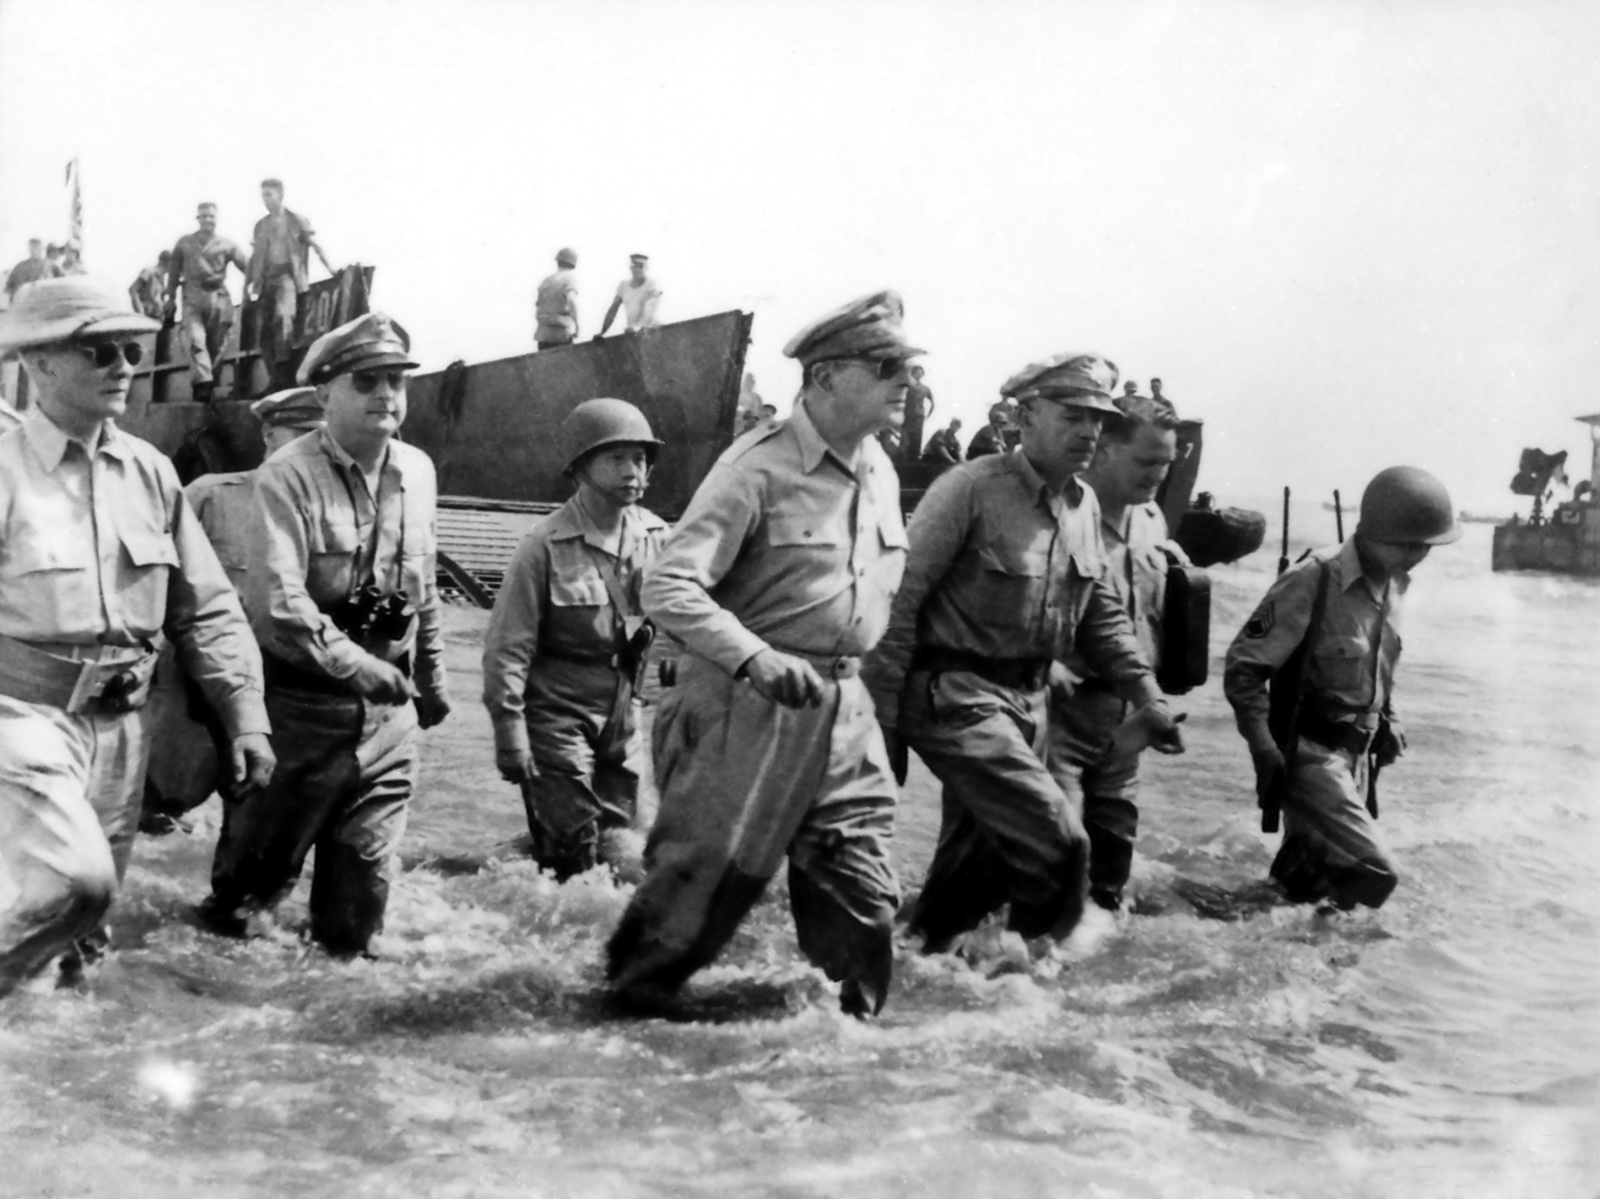 U.S. General Douglas MacArthur wades ashore during initial landings at Leyte, Philippine Islands in October 1944.